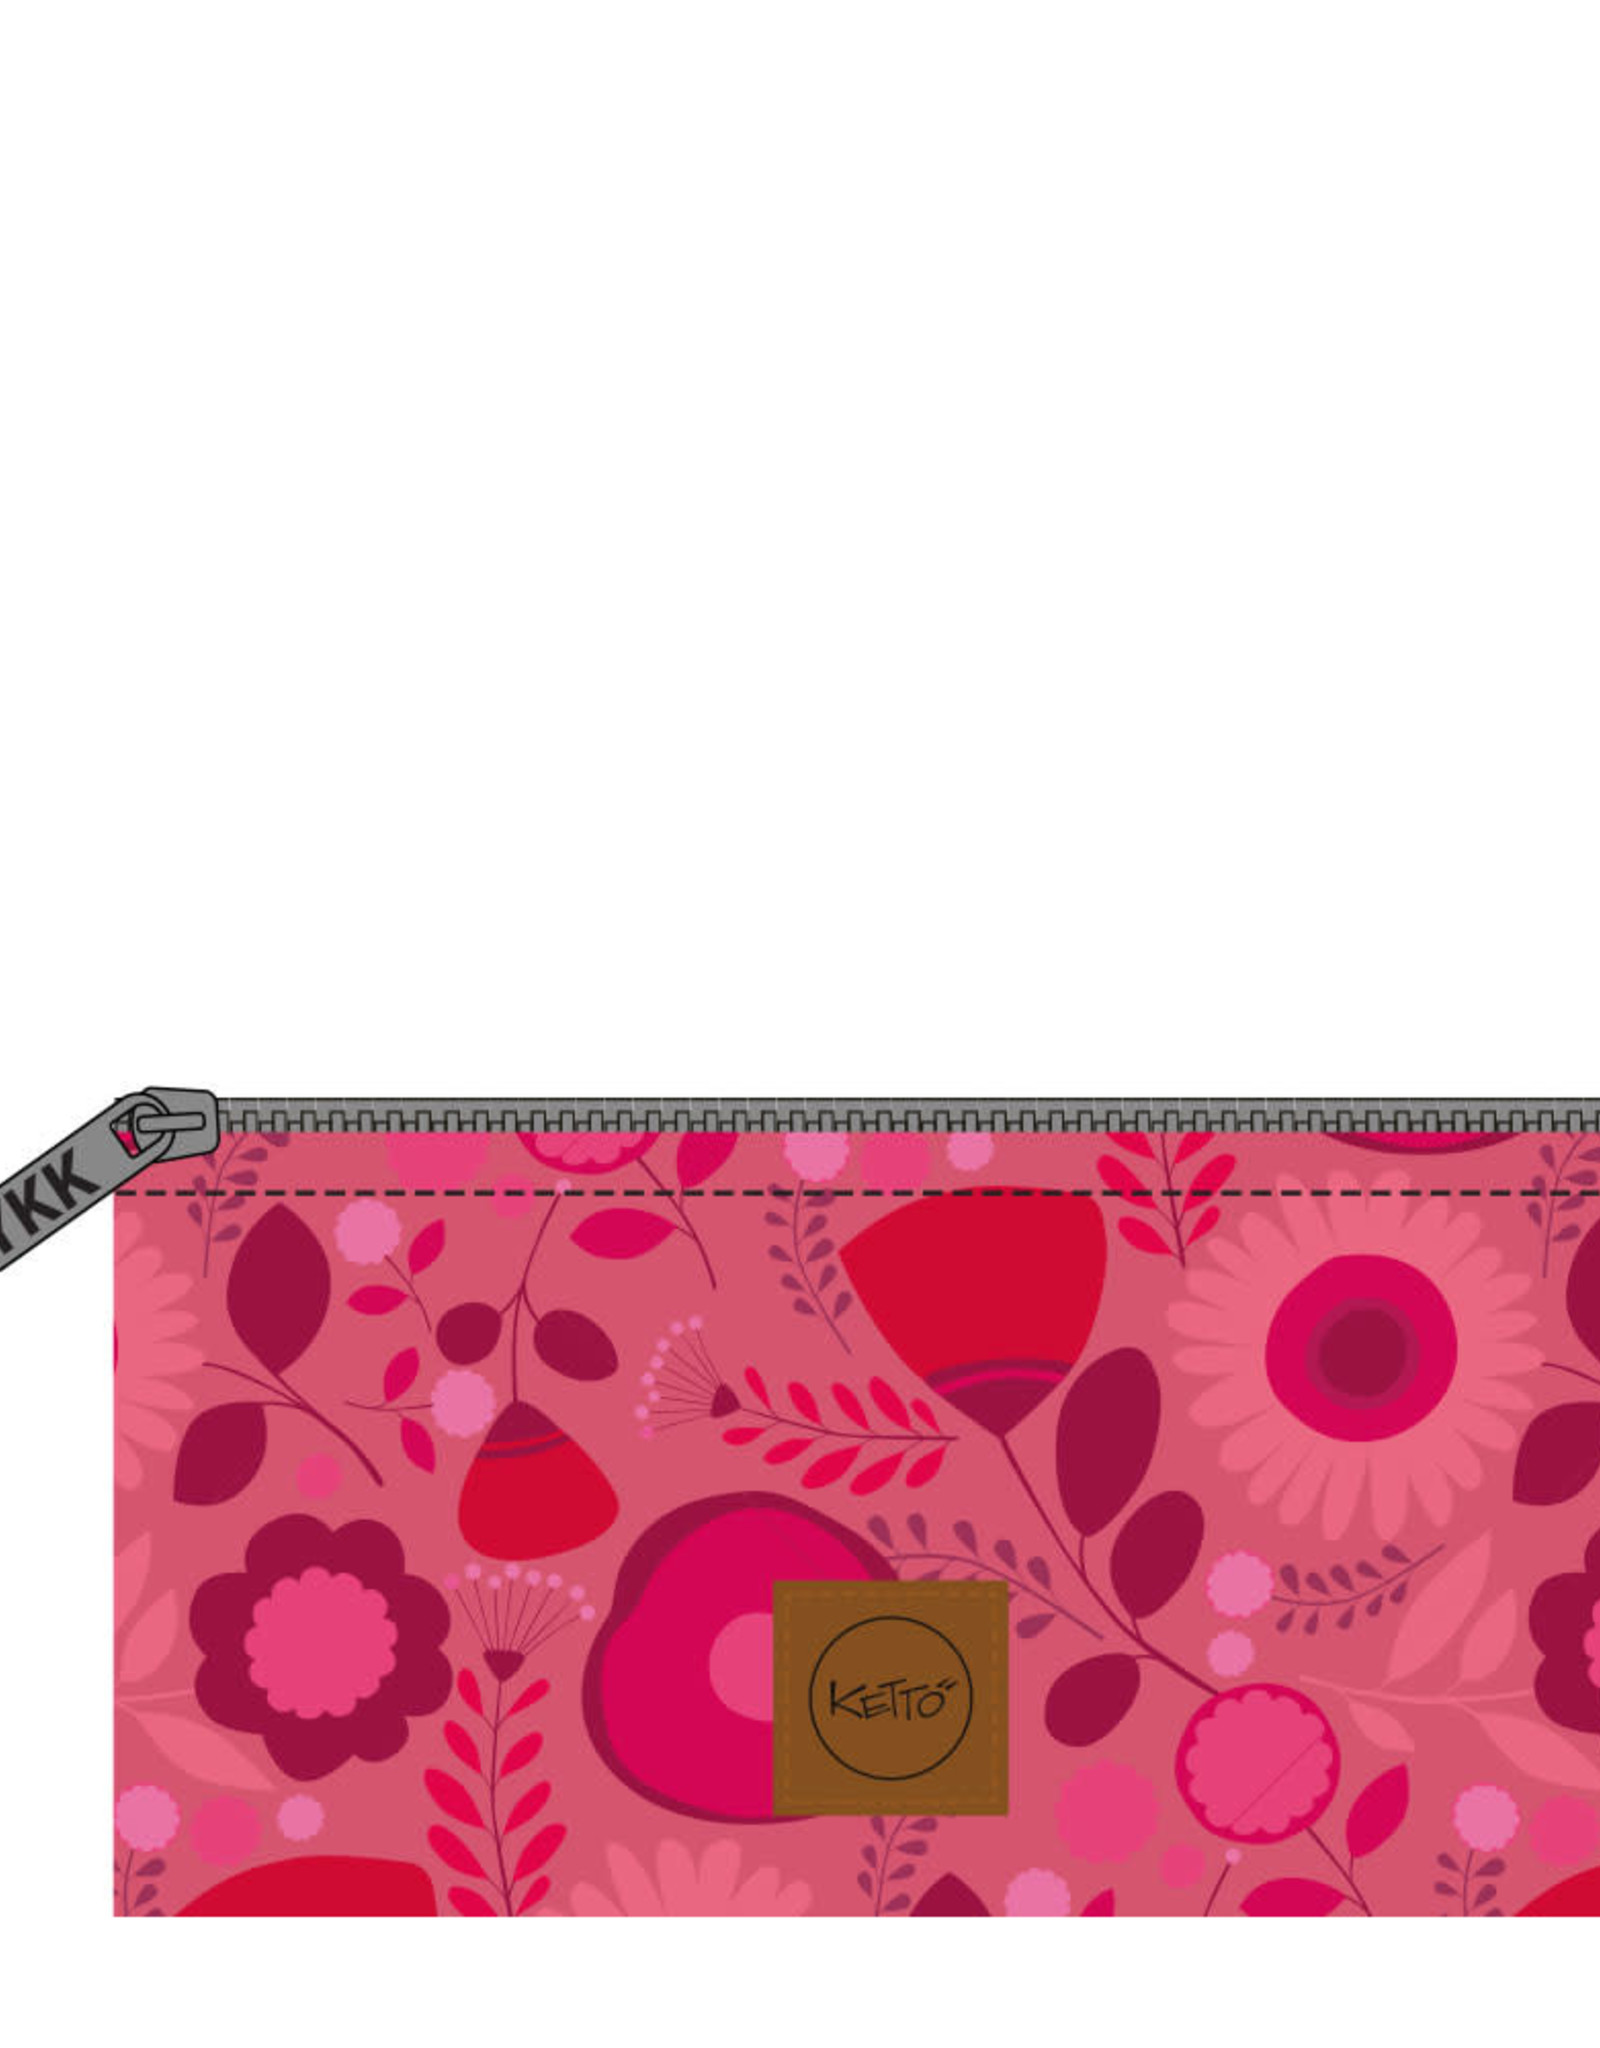 Ketto Petite pochette fleurs roses